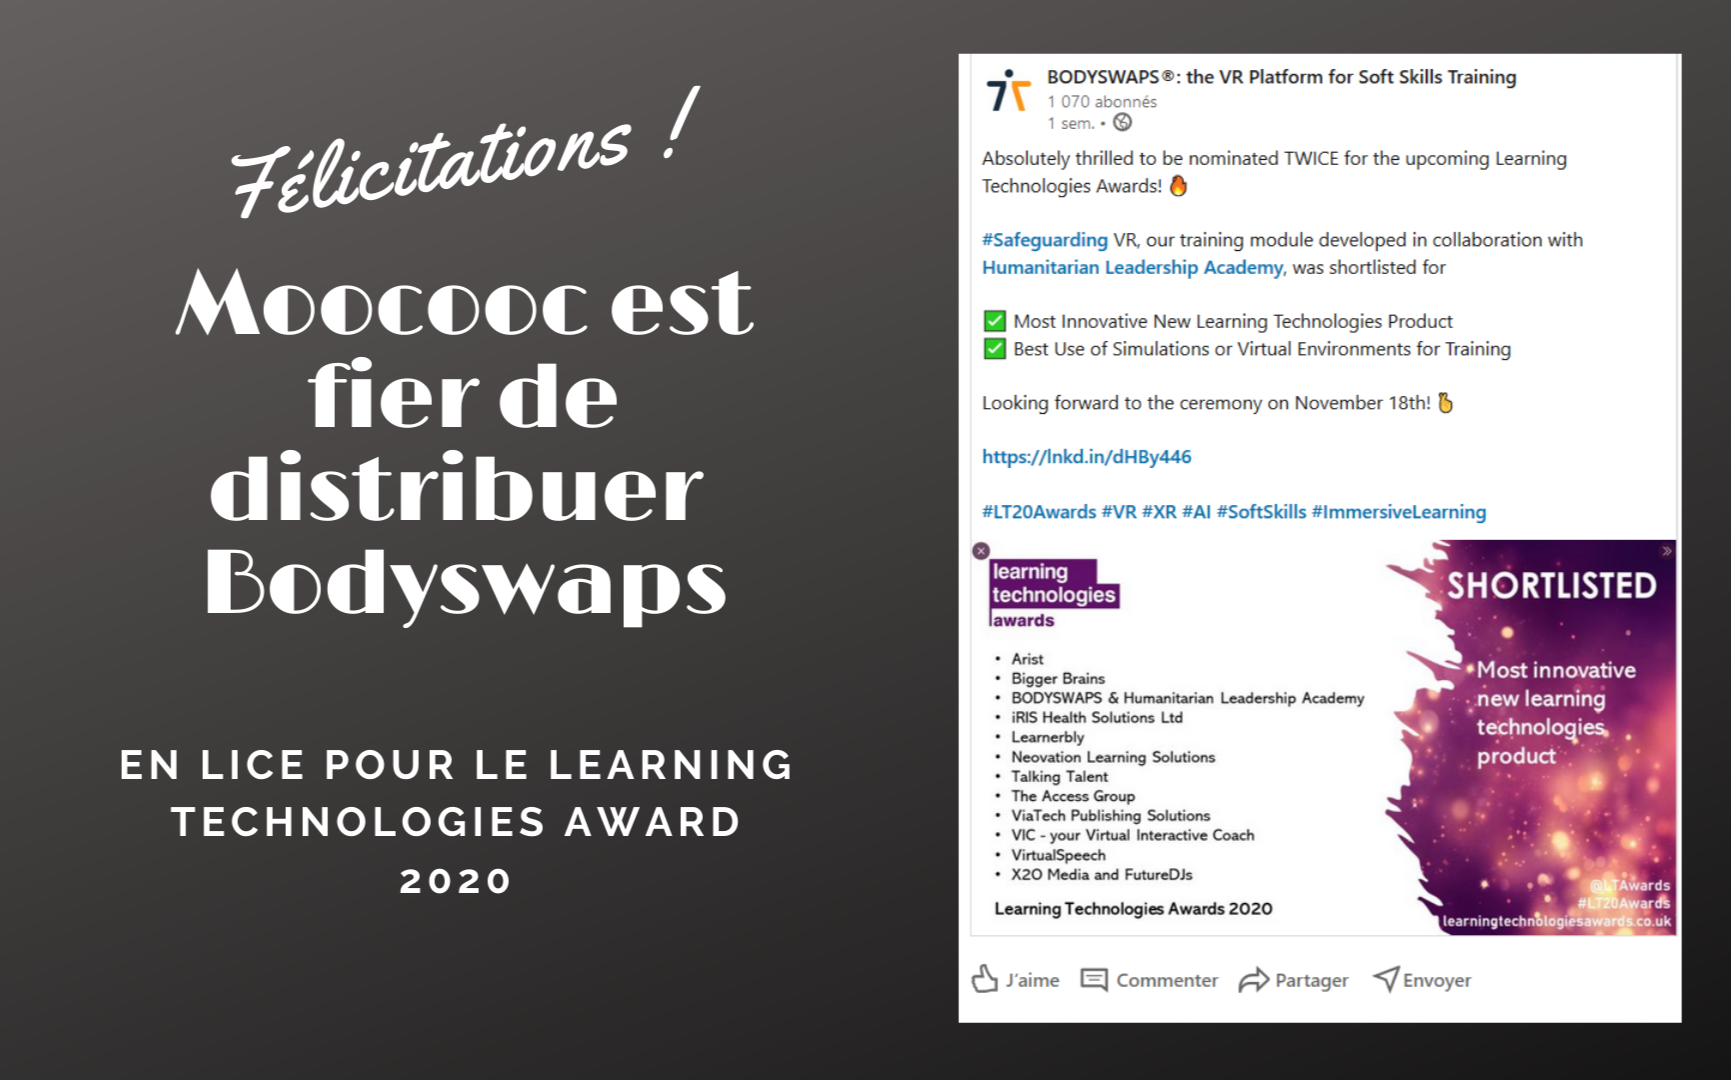 Bodyswaps Learning Technologies Award